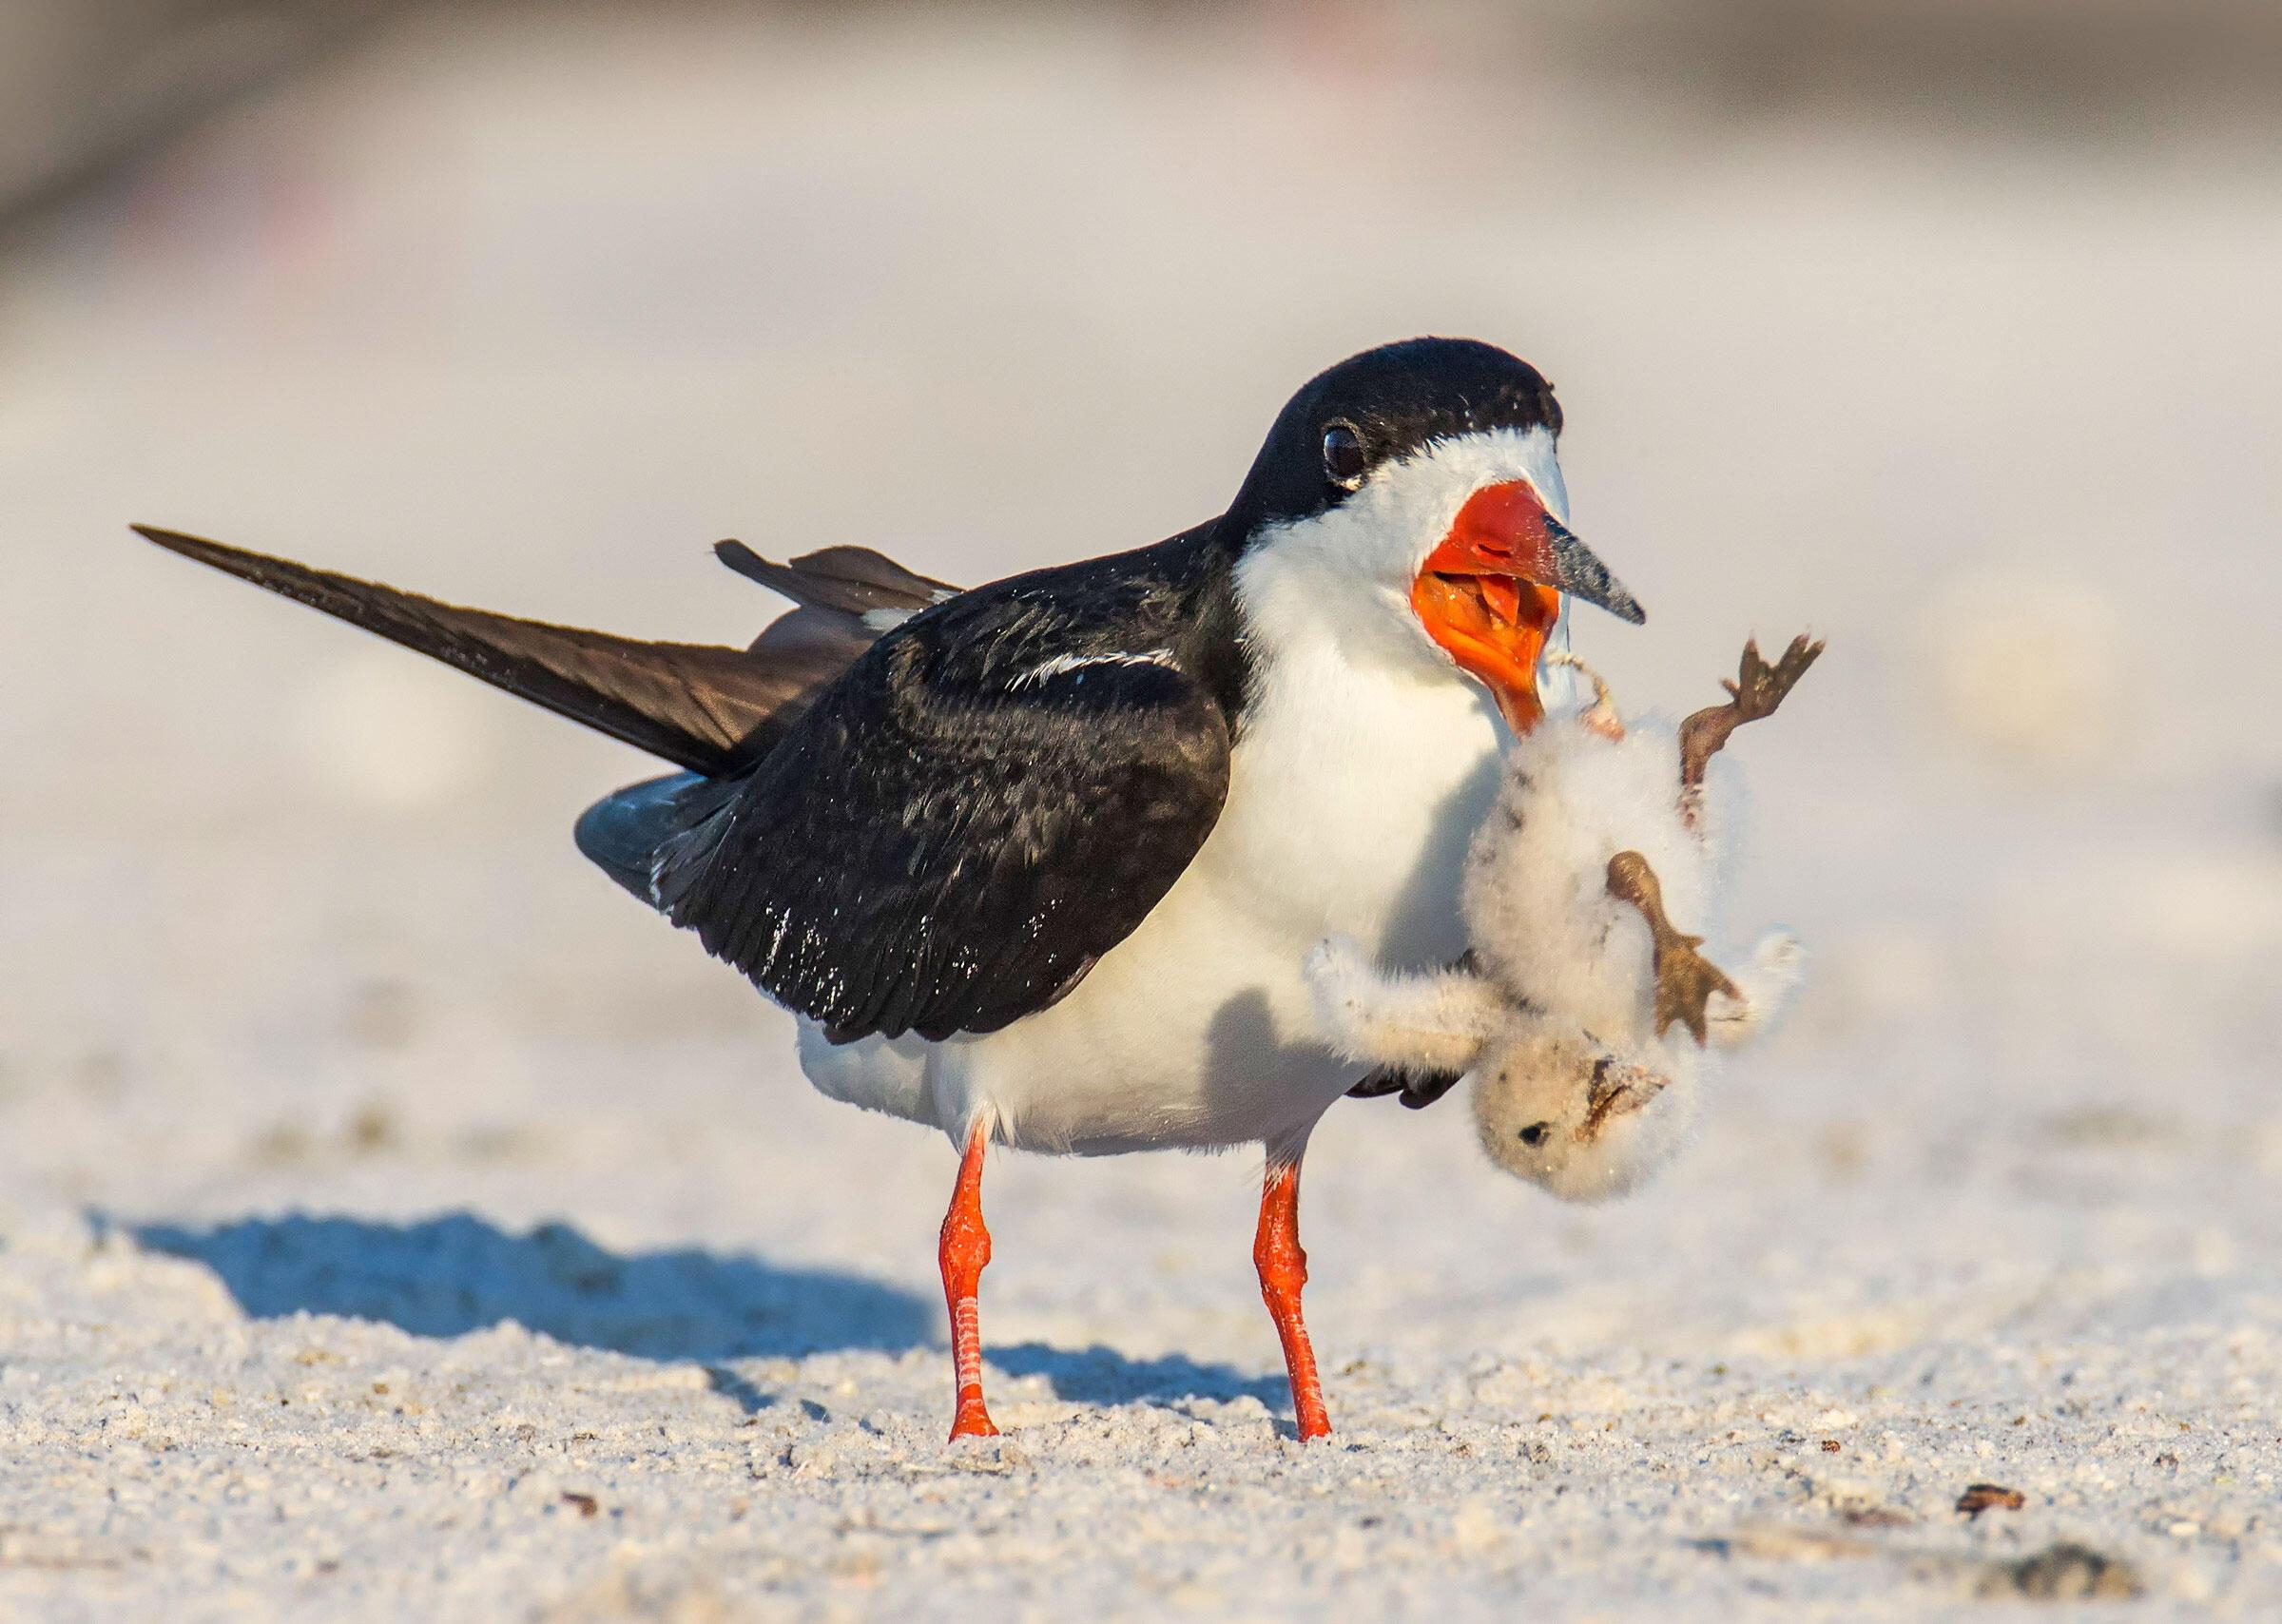 Black Skimmer/Amateur Category. Amy Marques/Audubon Photography Awards